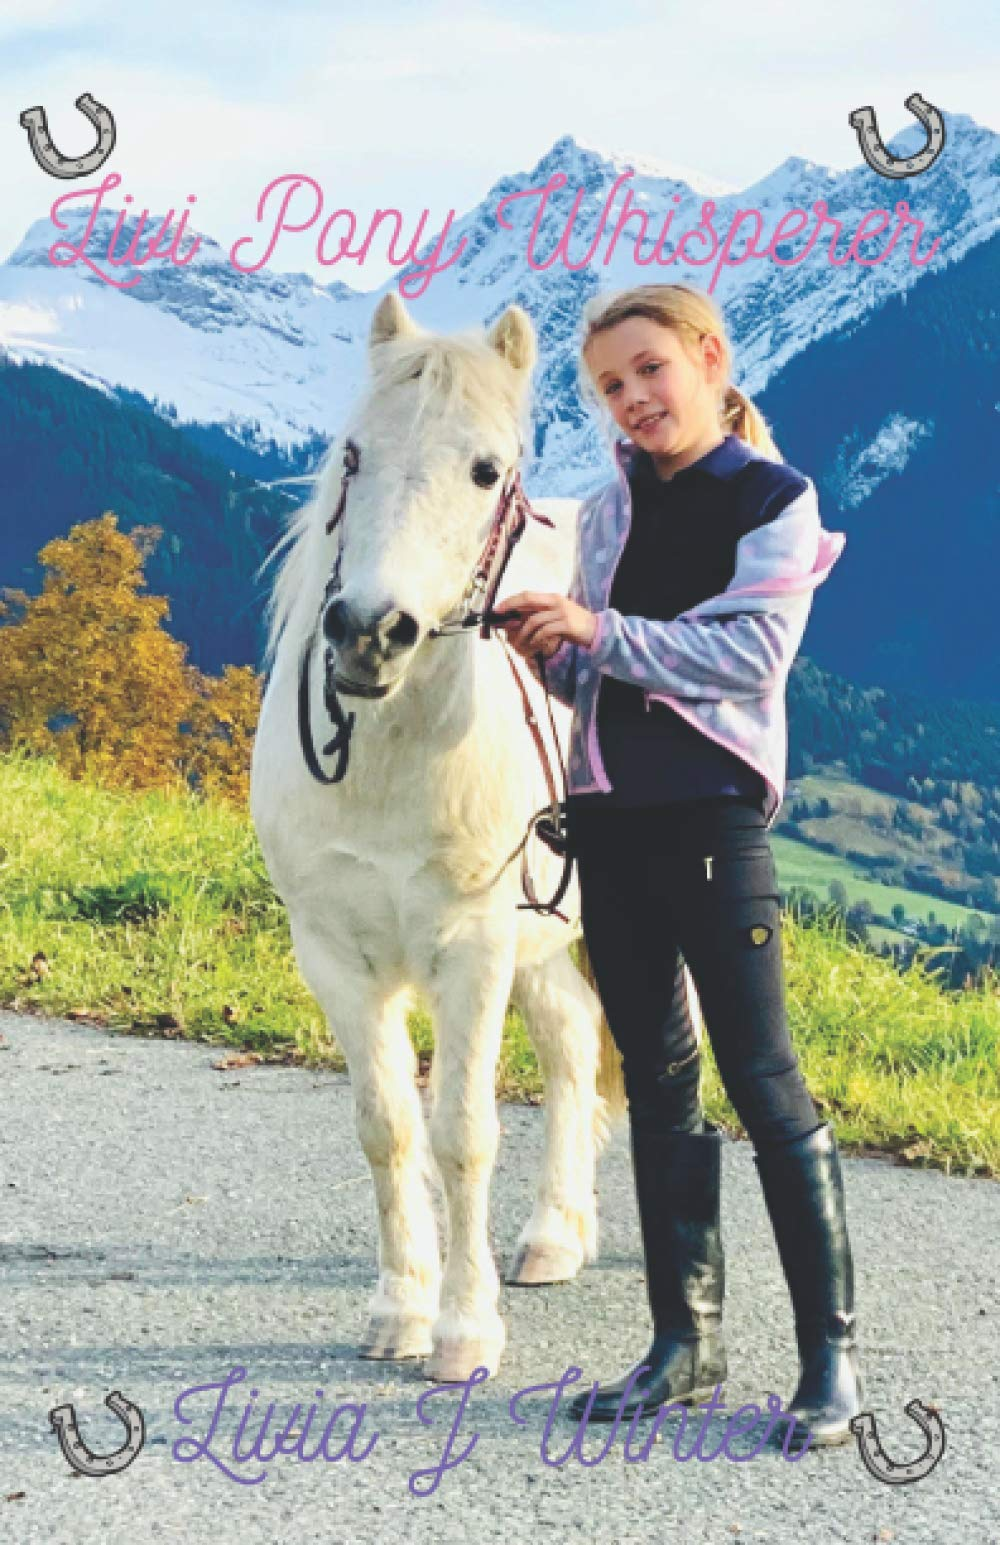 Livi Pony Whisperer: A tale to encourage (colour model)